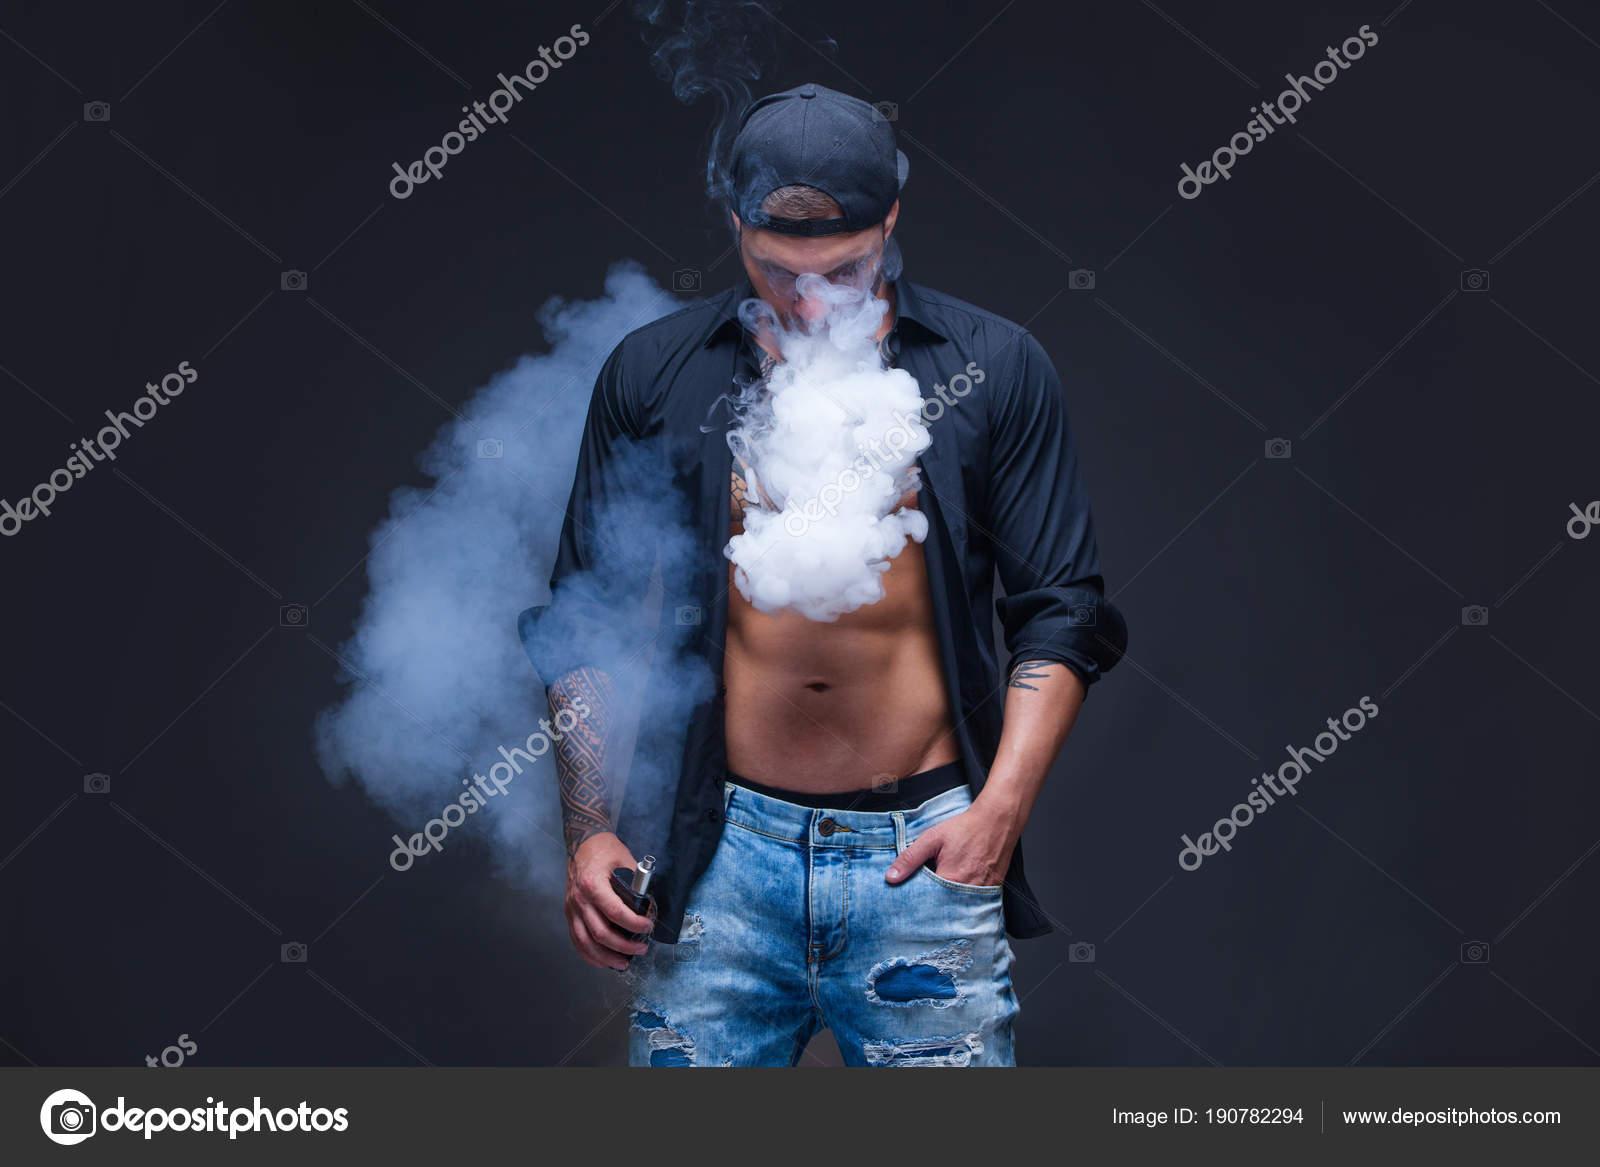 2a76e8d24b2c Vaper. El hombre vestido con vaqueros, camisa negra y gorra de ...